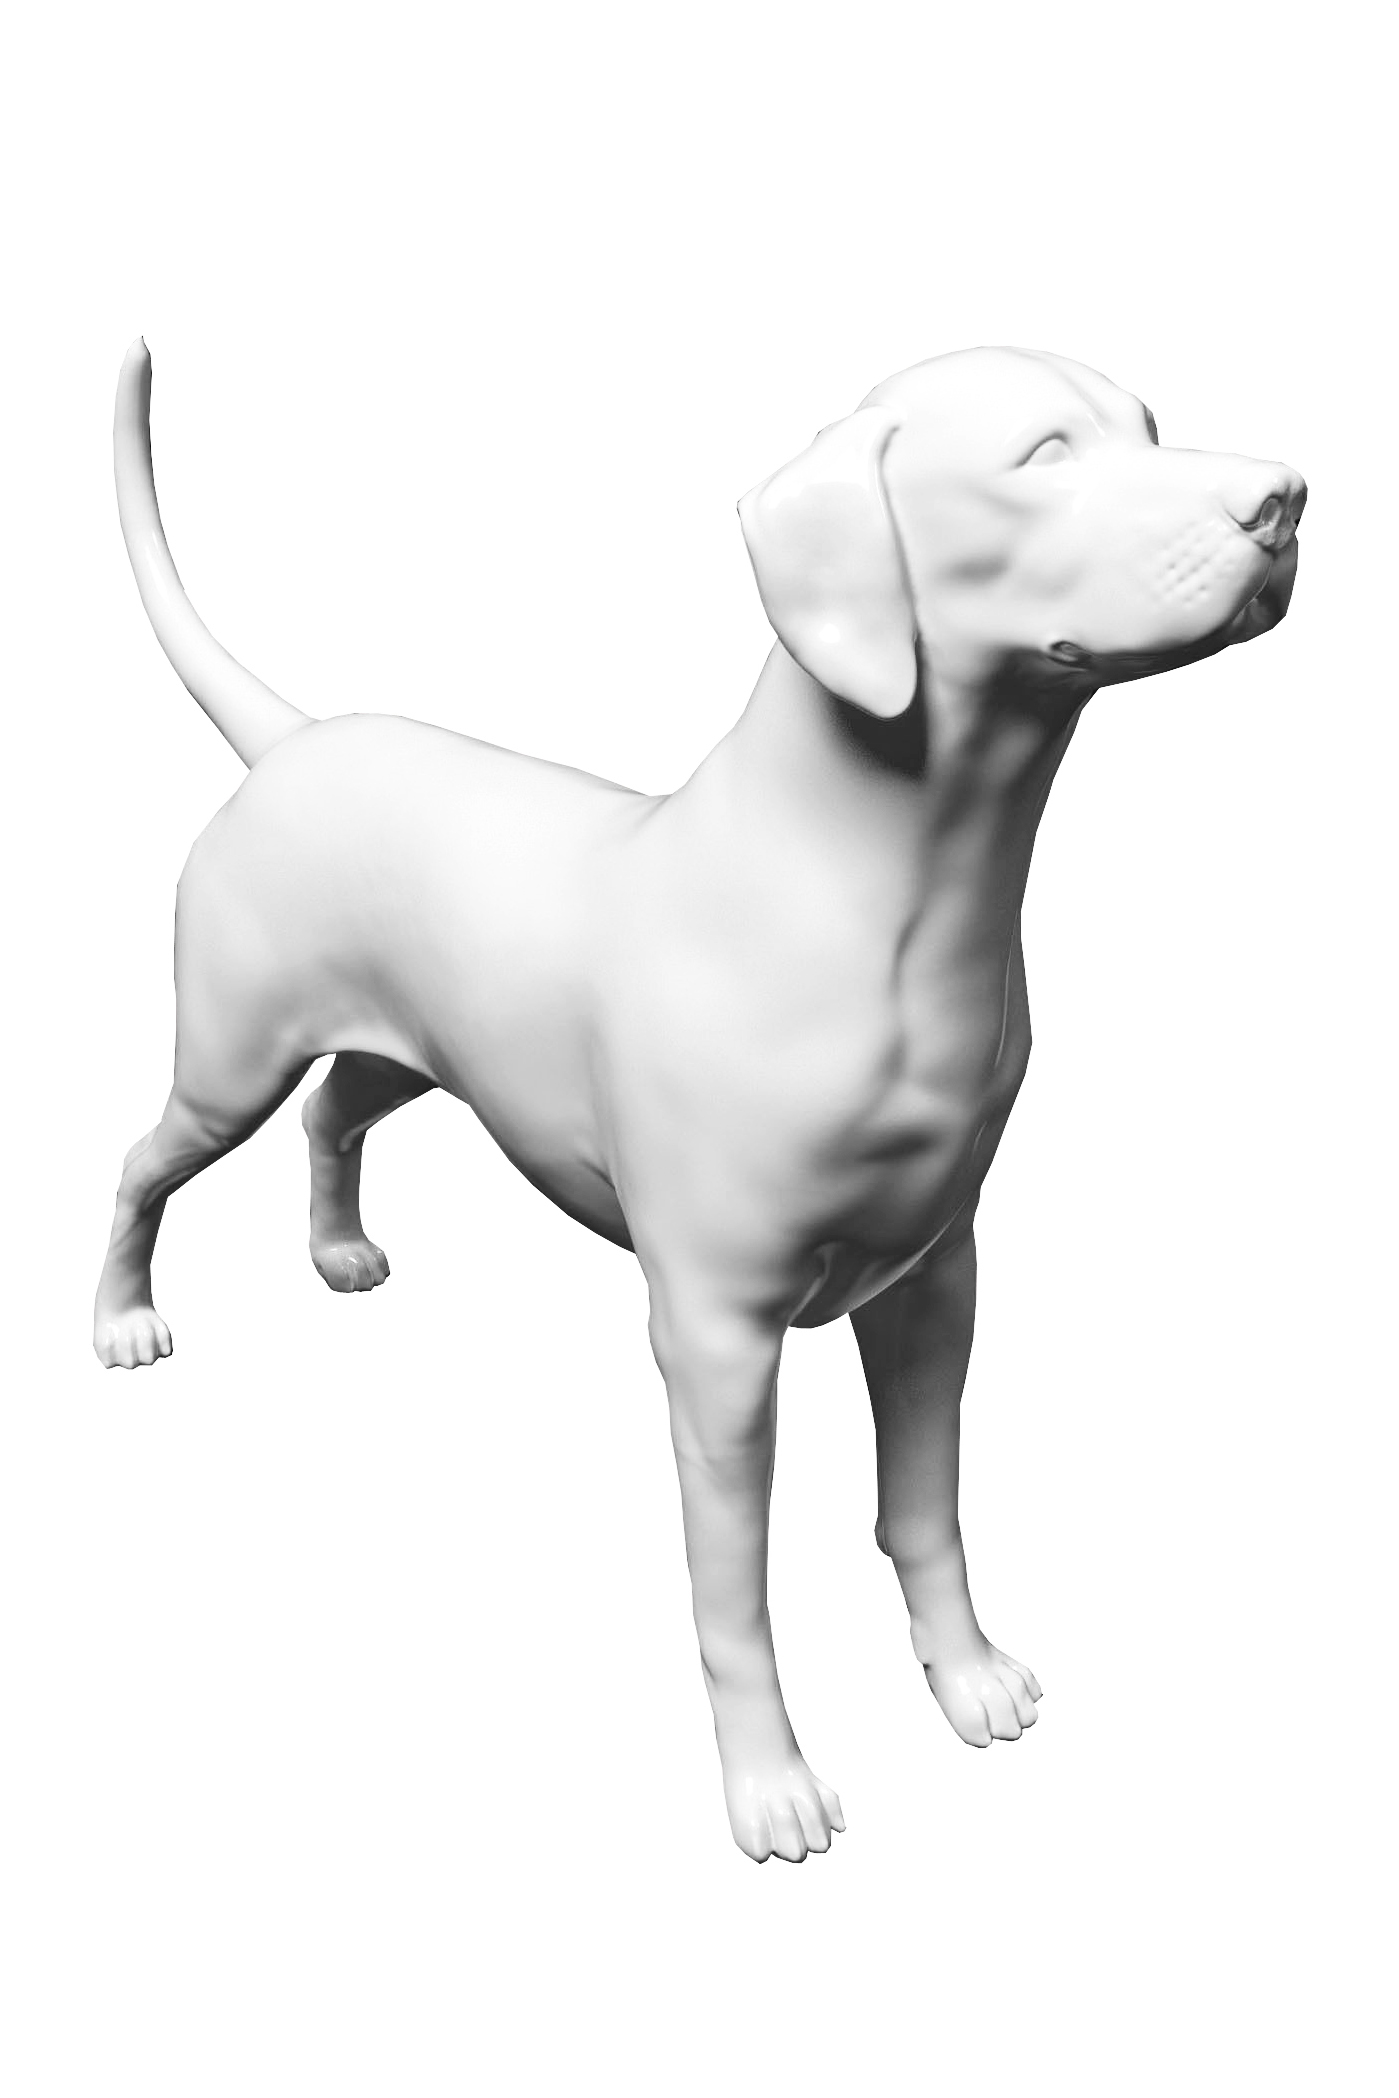 Манекены животных, собаки